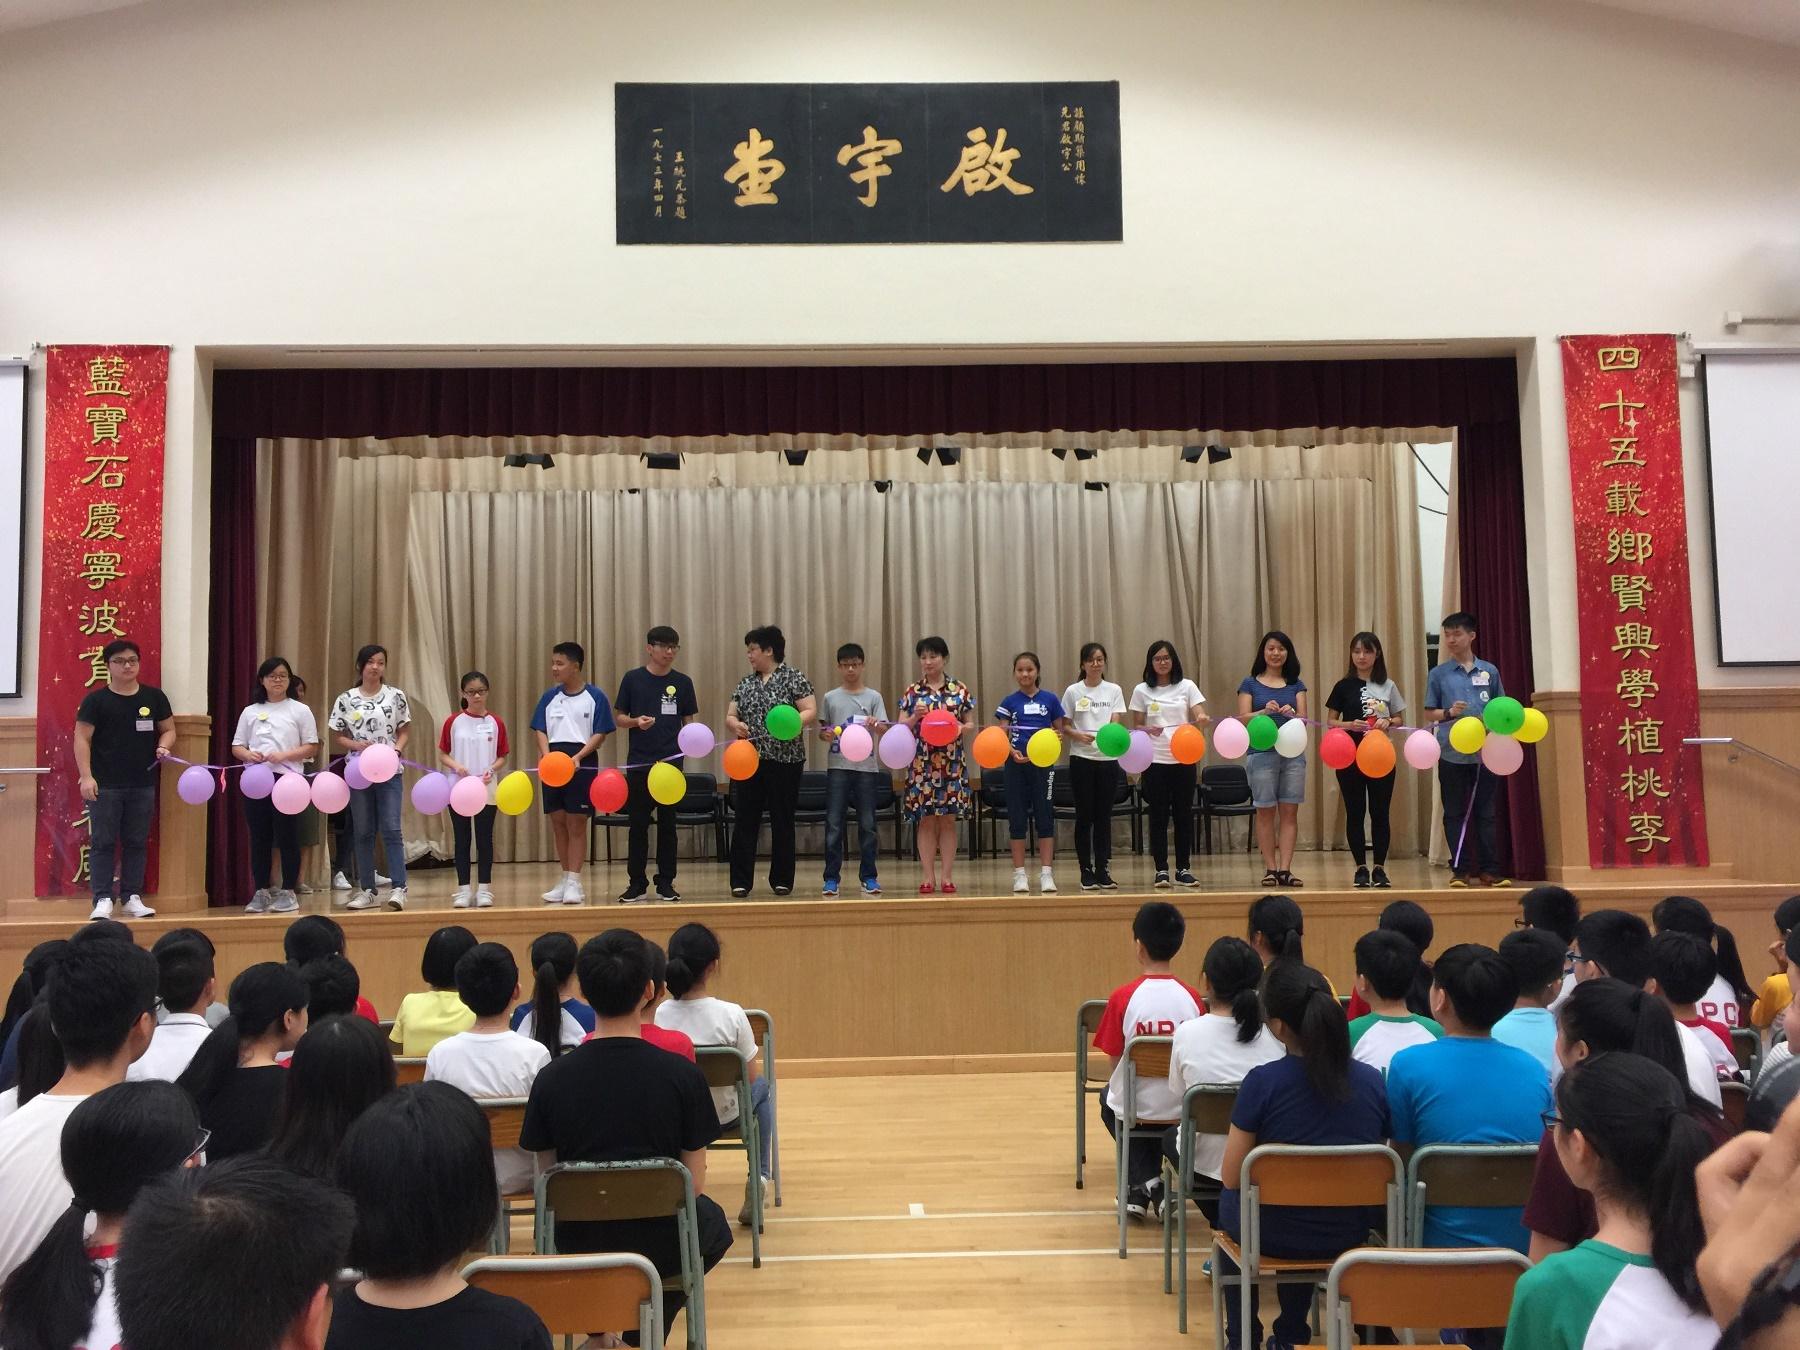 http://www.npc.edu.hk/sites/default/files/img_5869.jpg